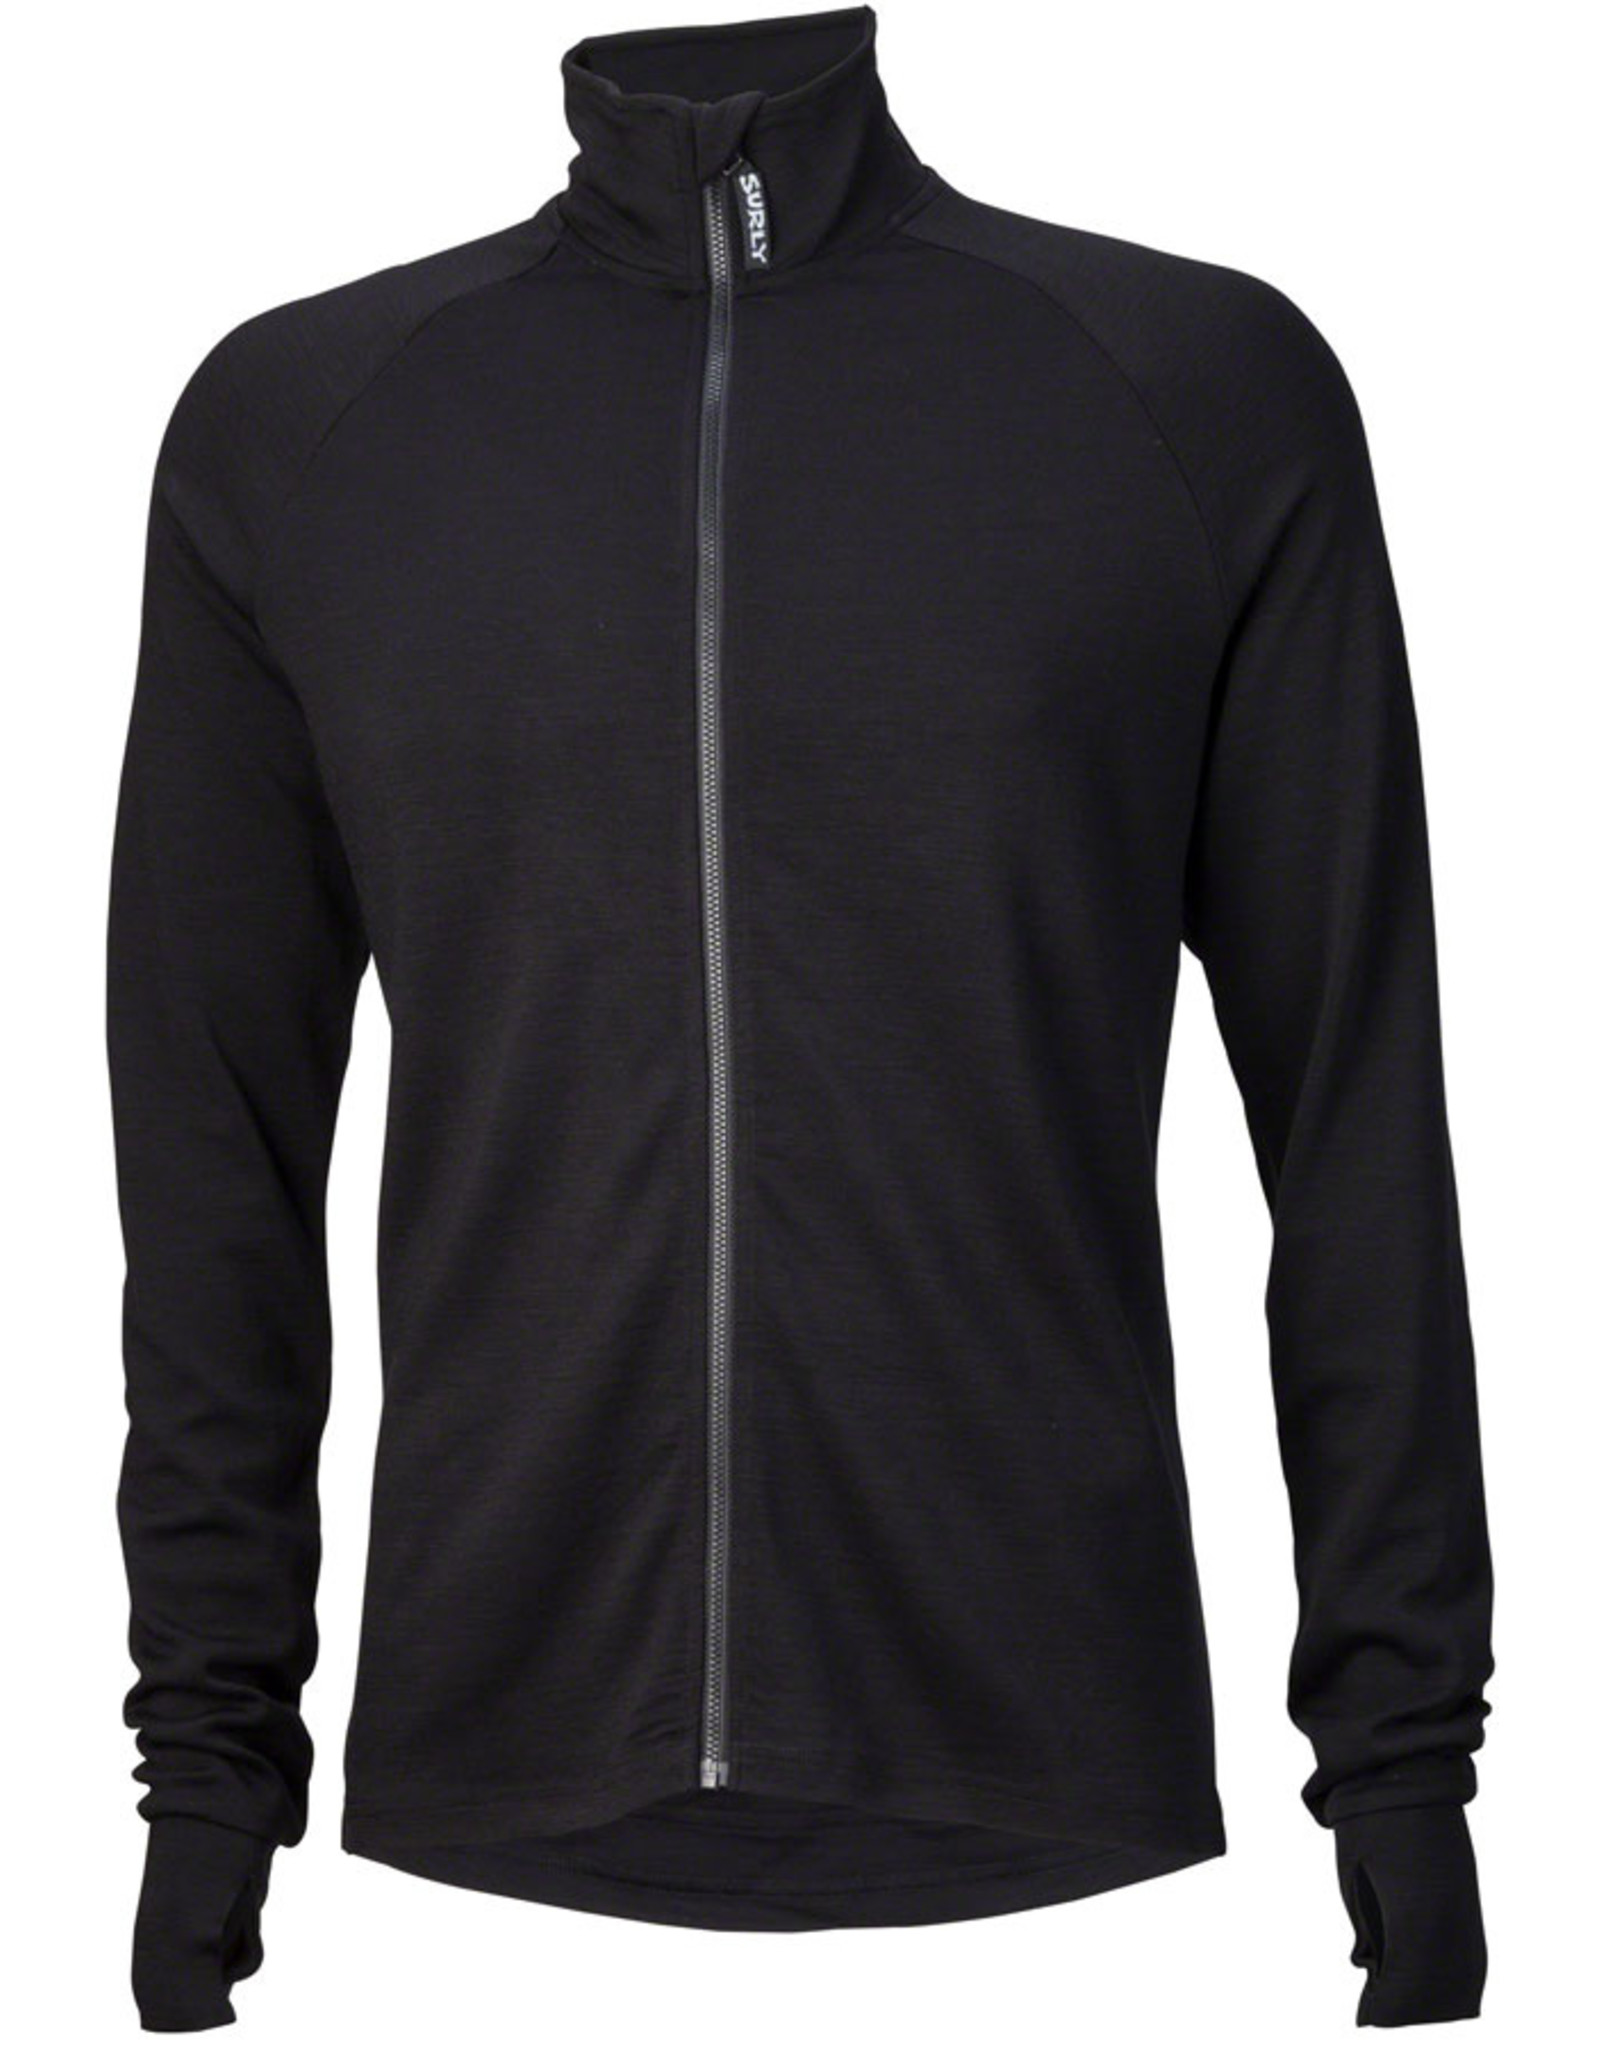 Surly Surly Merino Wool Jersey - Black, Long Sleeve, Men's, Small